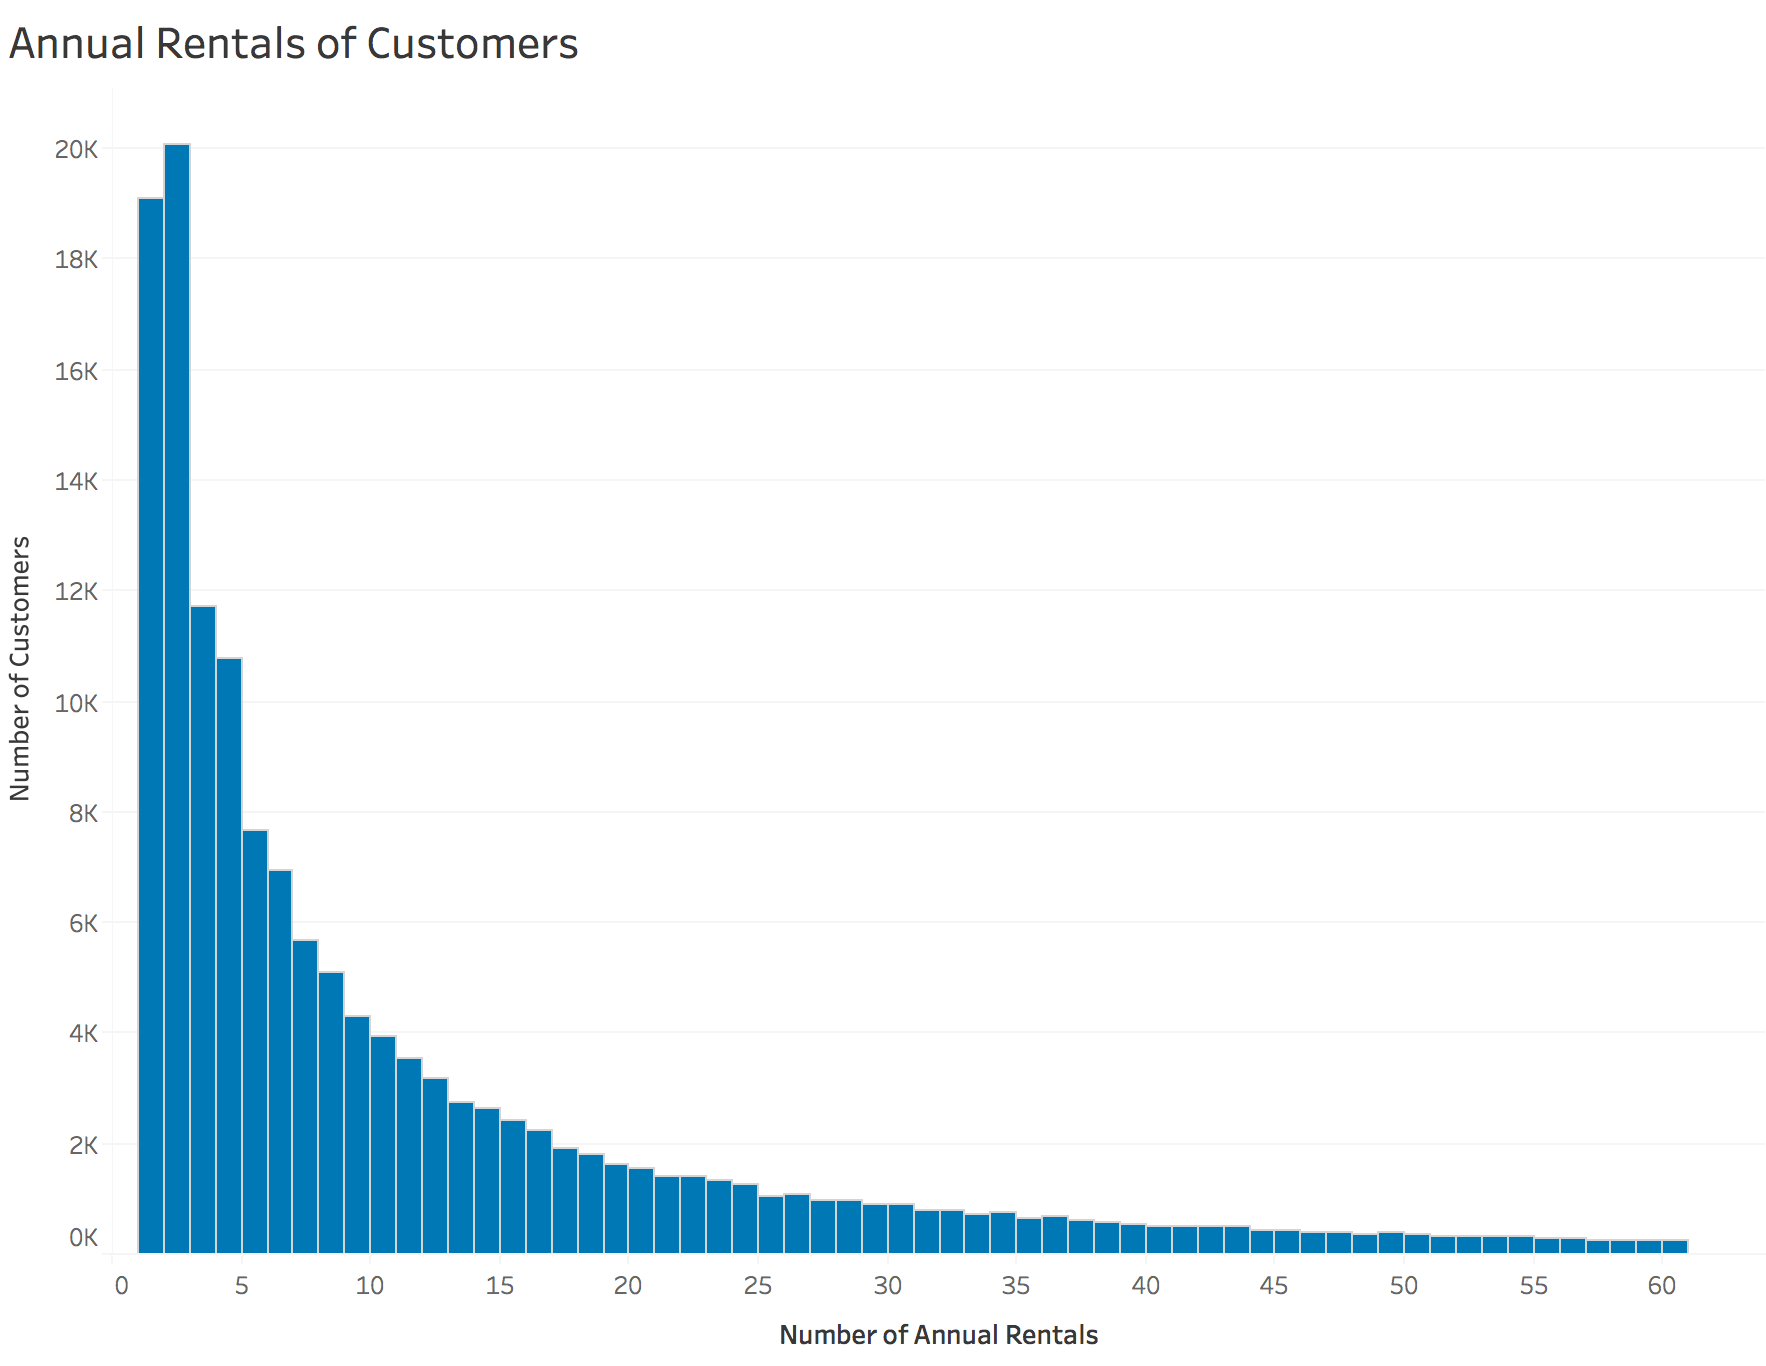 Distribution of Rentals per Customer